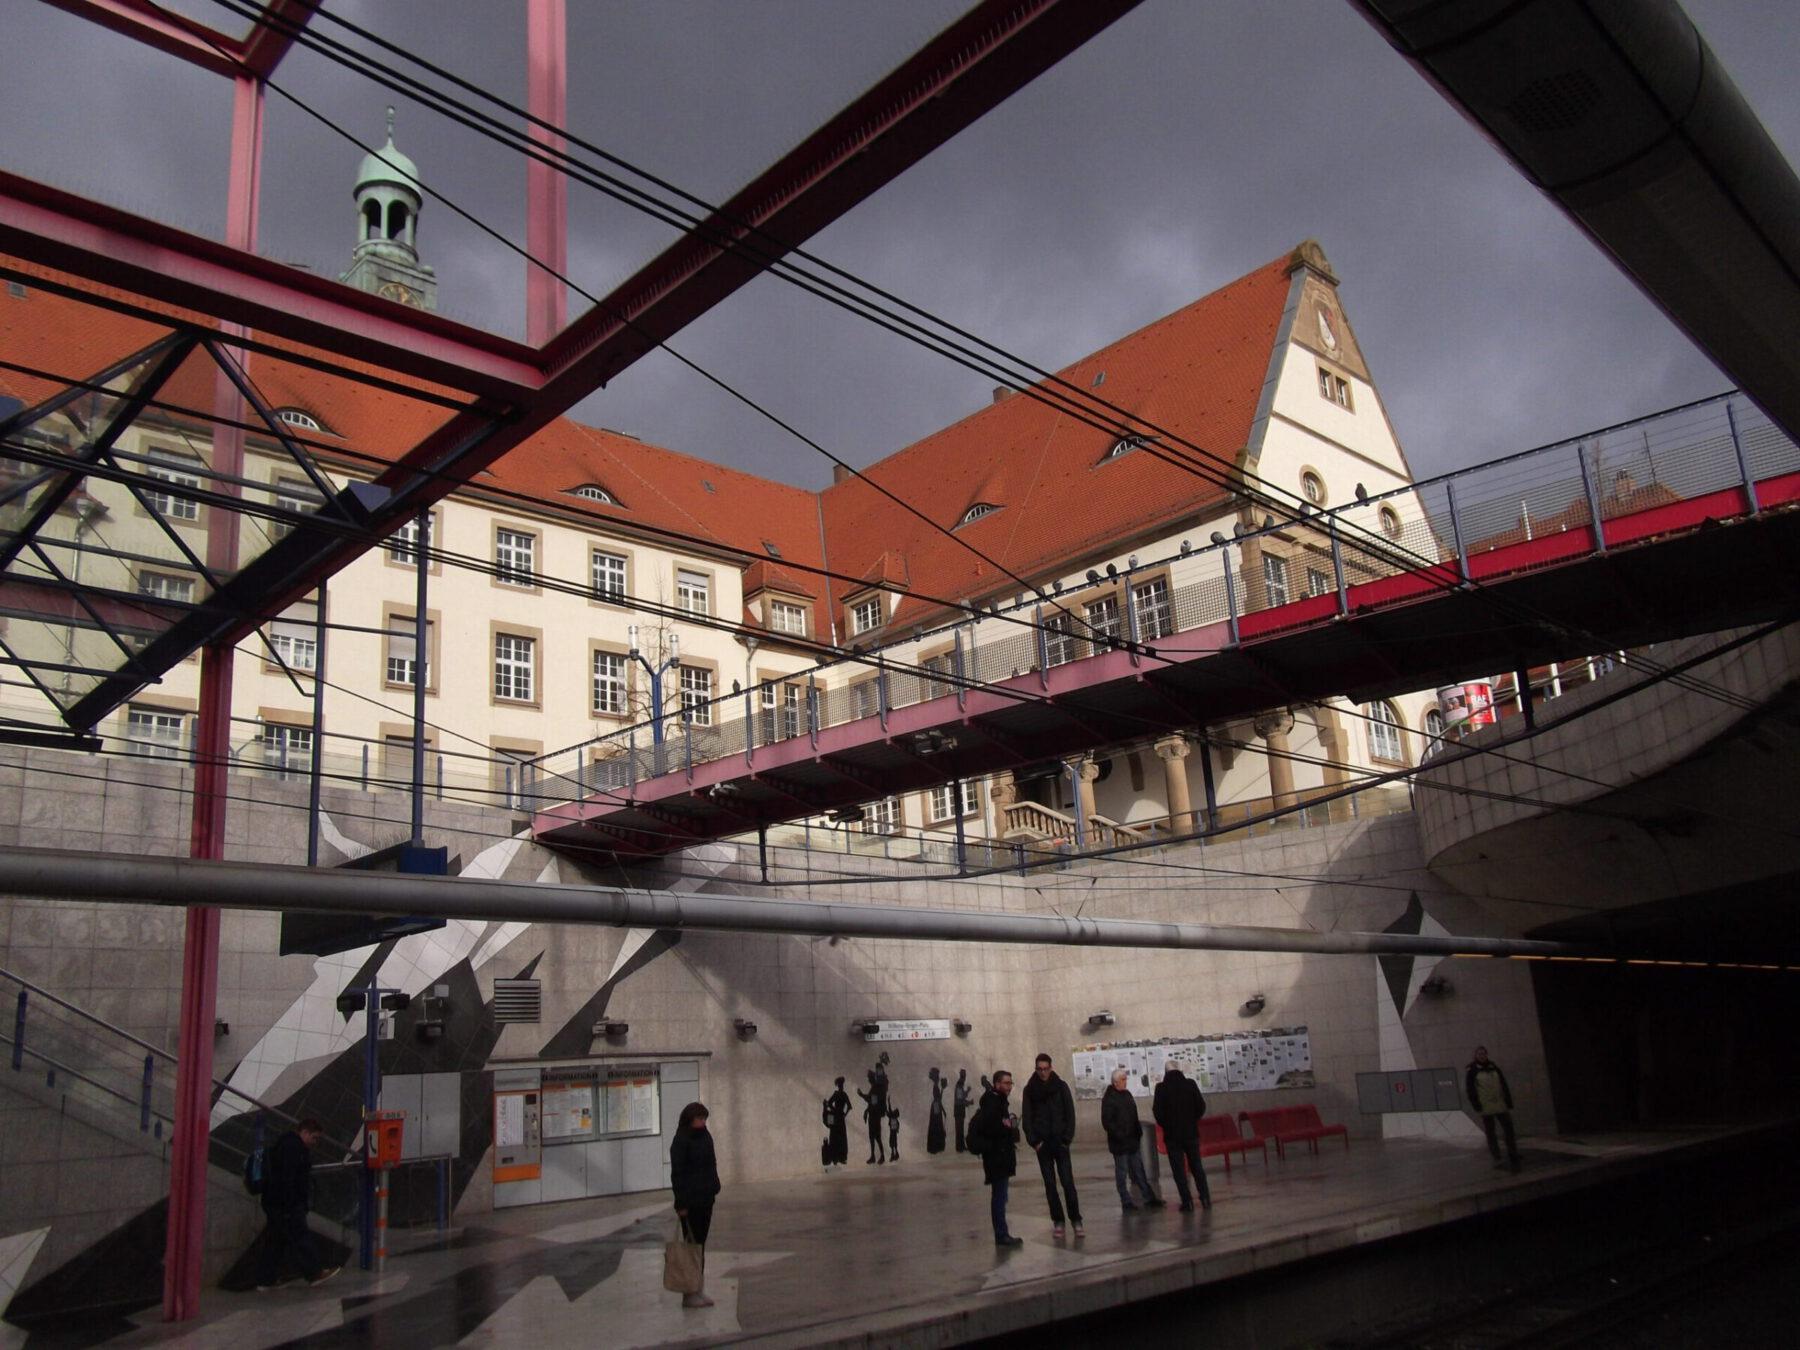 U-Bahnhaltestelle am Rathaus